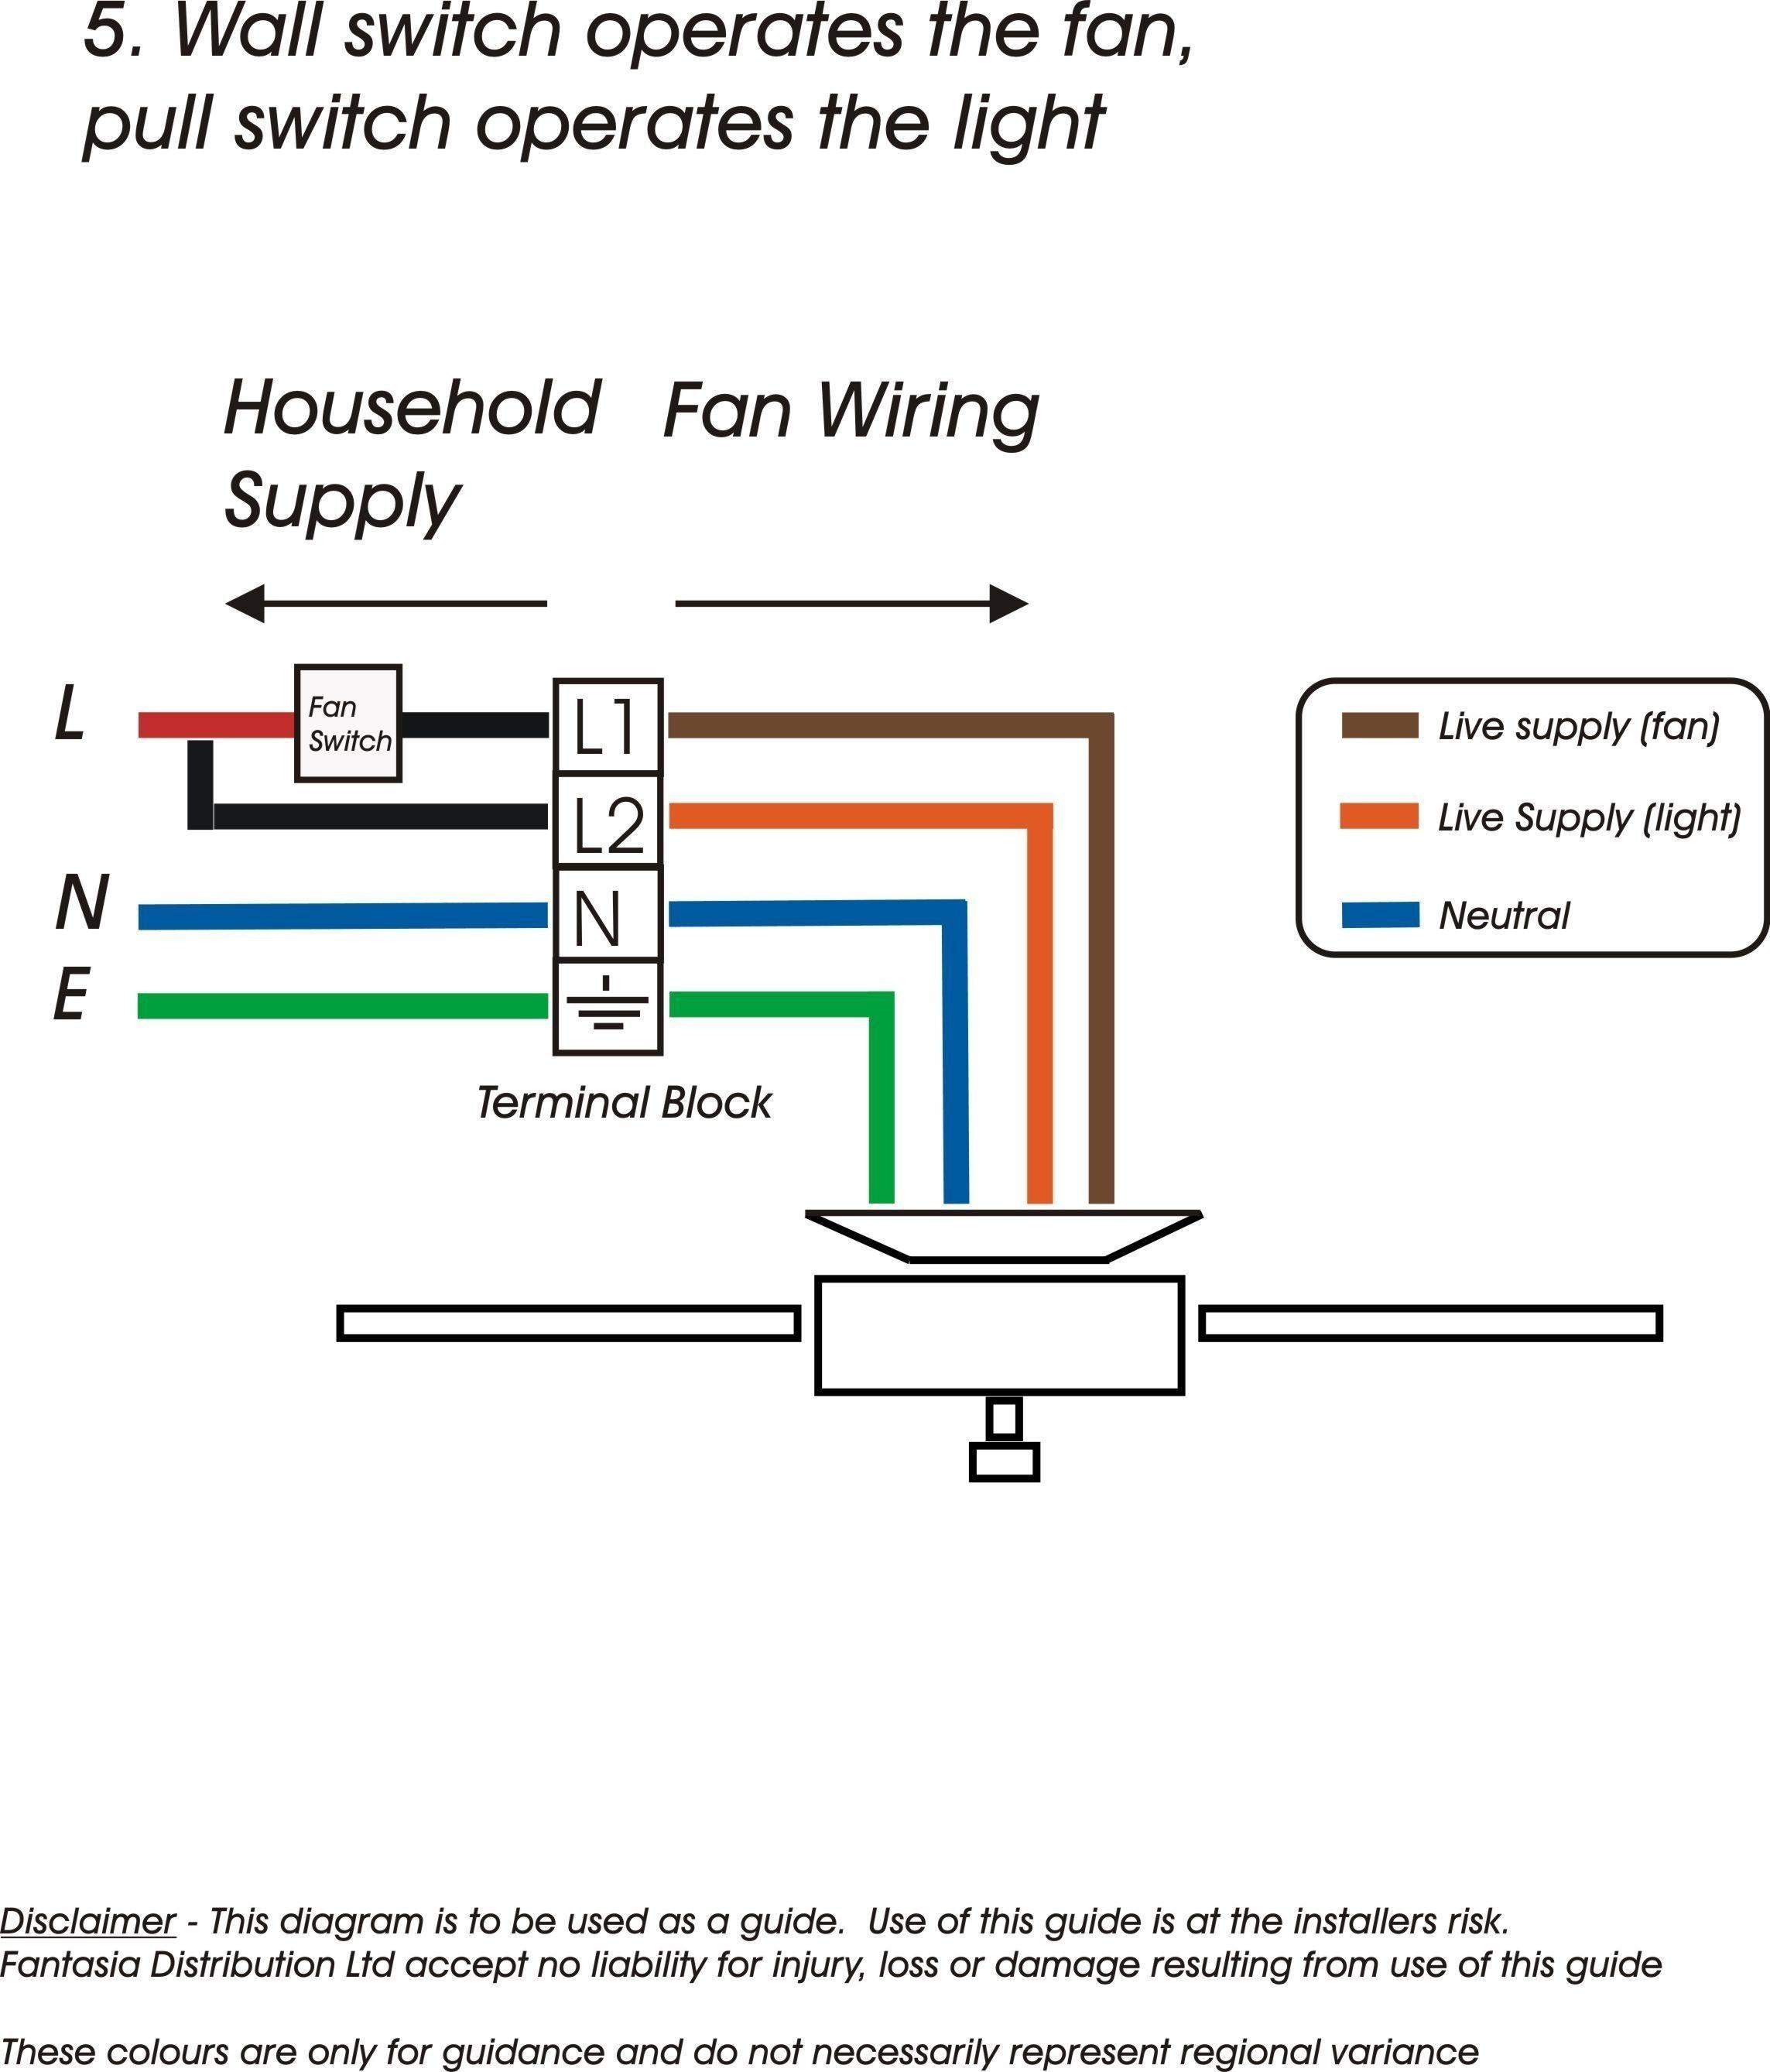 Leviton Decora 3 Way Switch Wiring Diagram 5603 Book Of How To Wire - Leviton Decora 3 Way Switch Wiring Diagram 5603